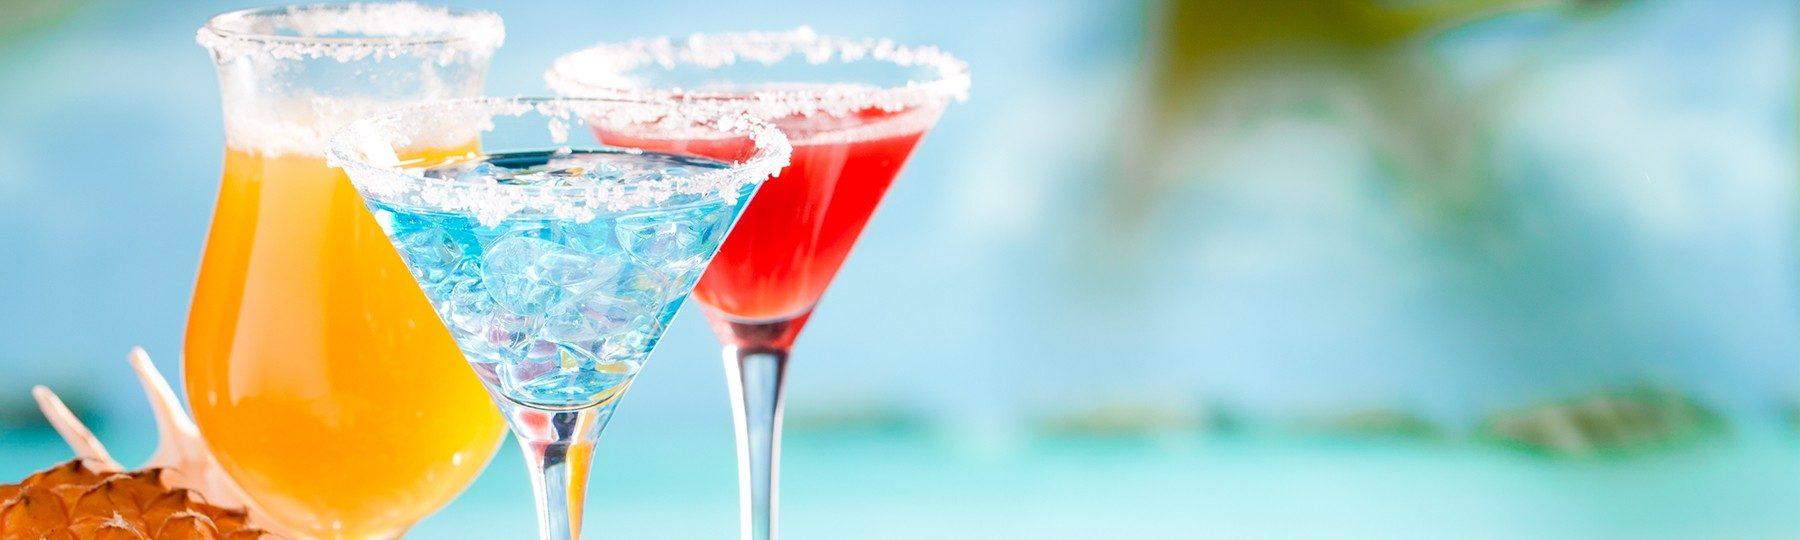 cocktail-class